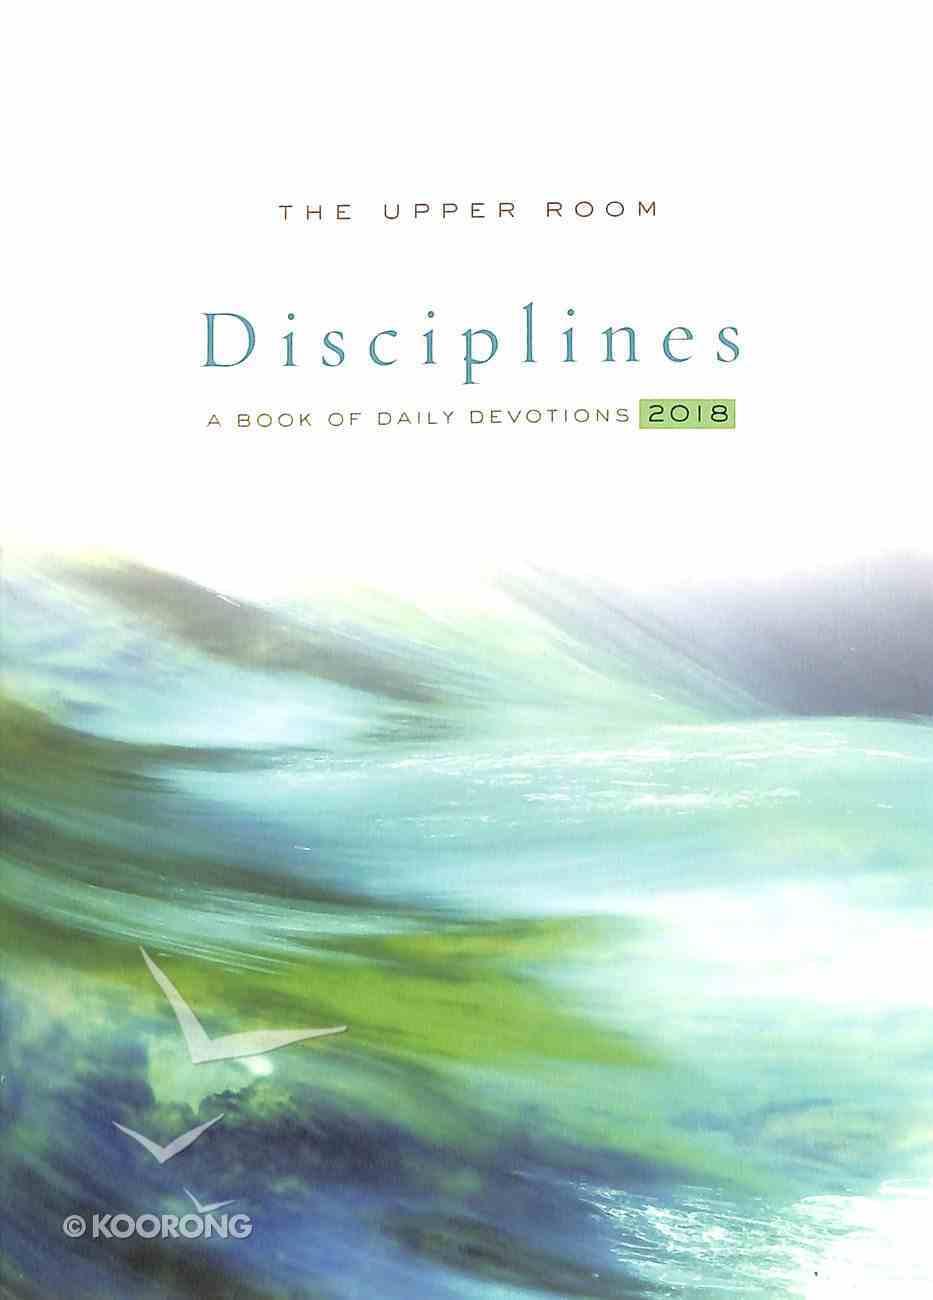 The Upper Room Disciplines 2018 Paperback